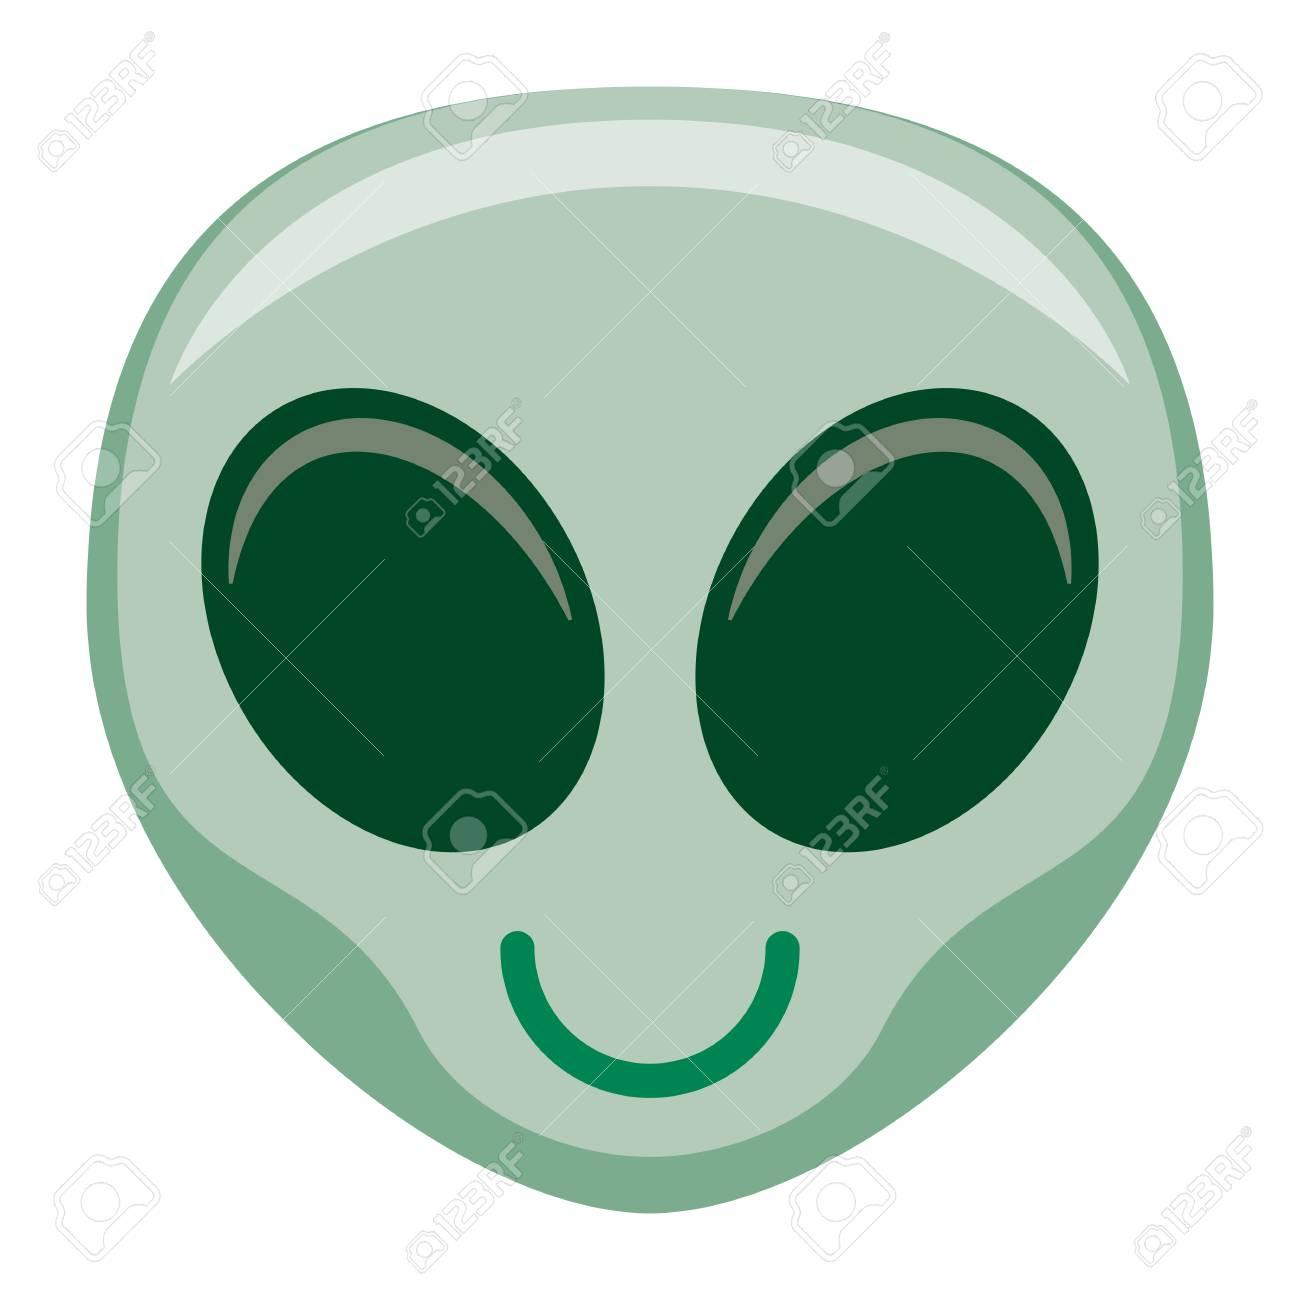 Vector Cartoon Alien Emoji Isolated On White Background Stock Photo